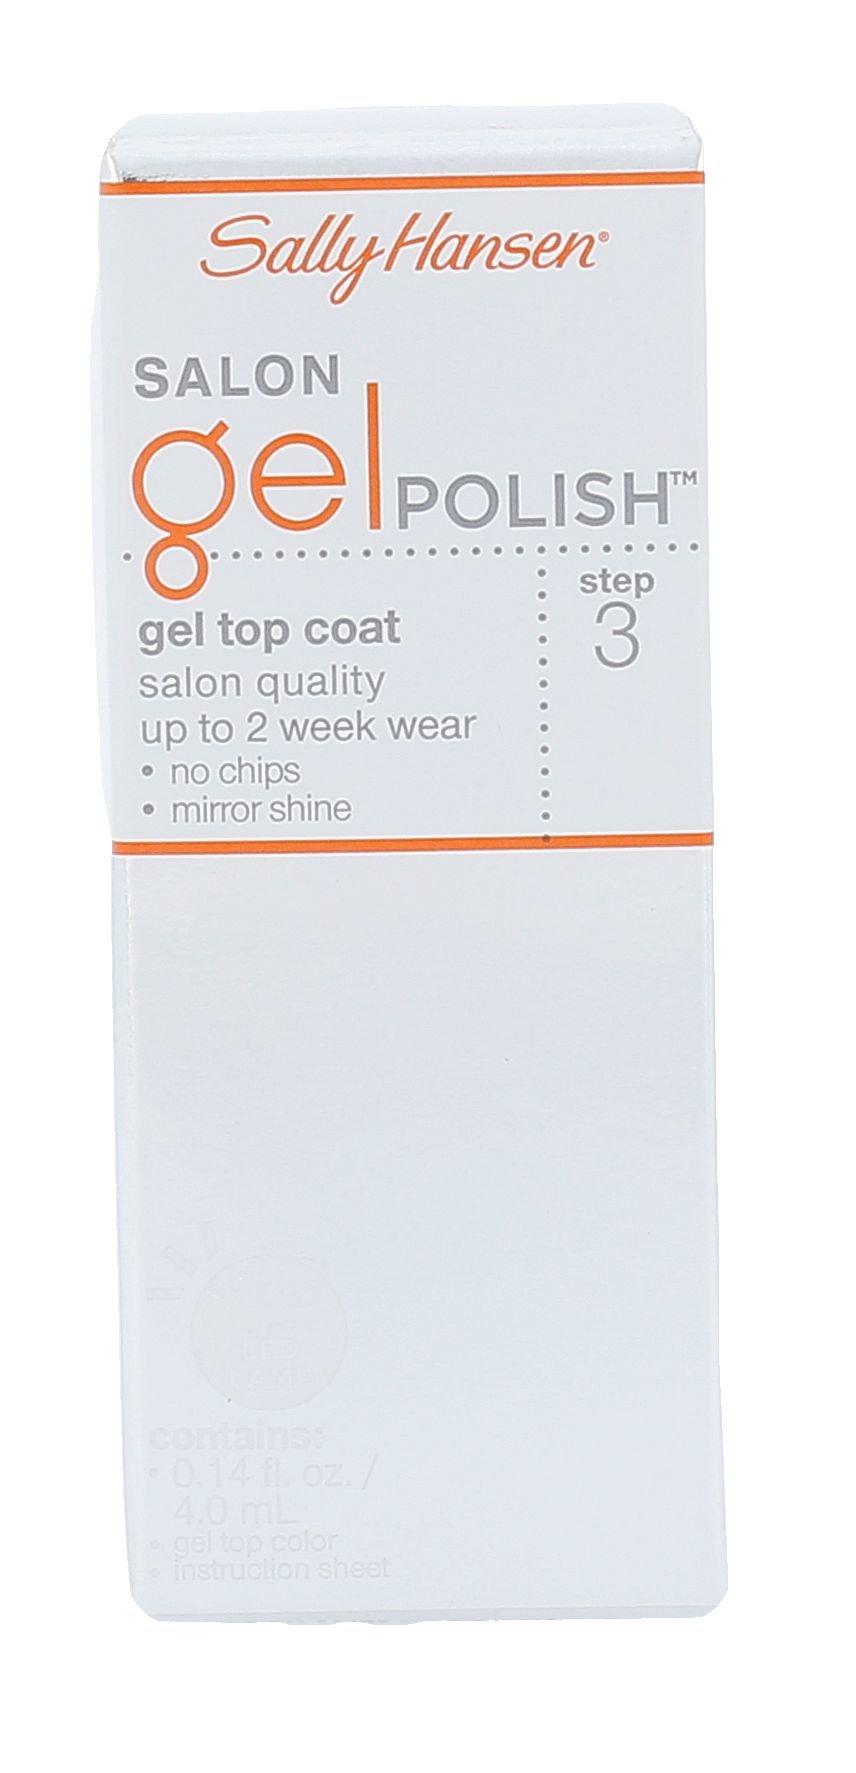 Sally Hansen Salon Gel Polish Nail Polish 4ml  Step 3